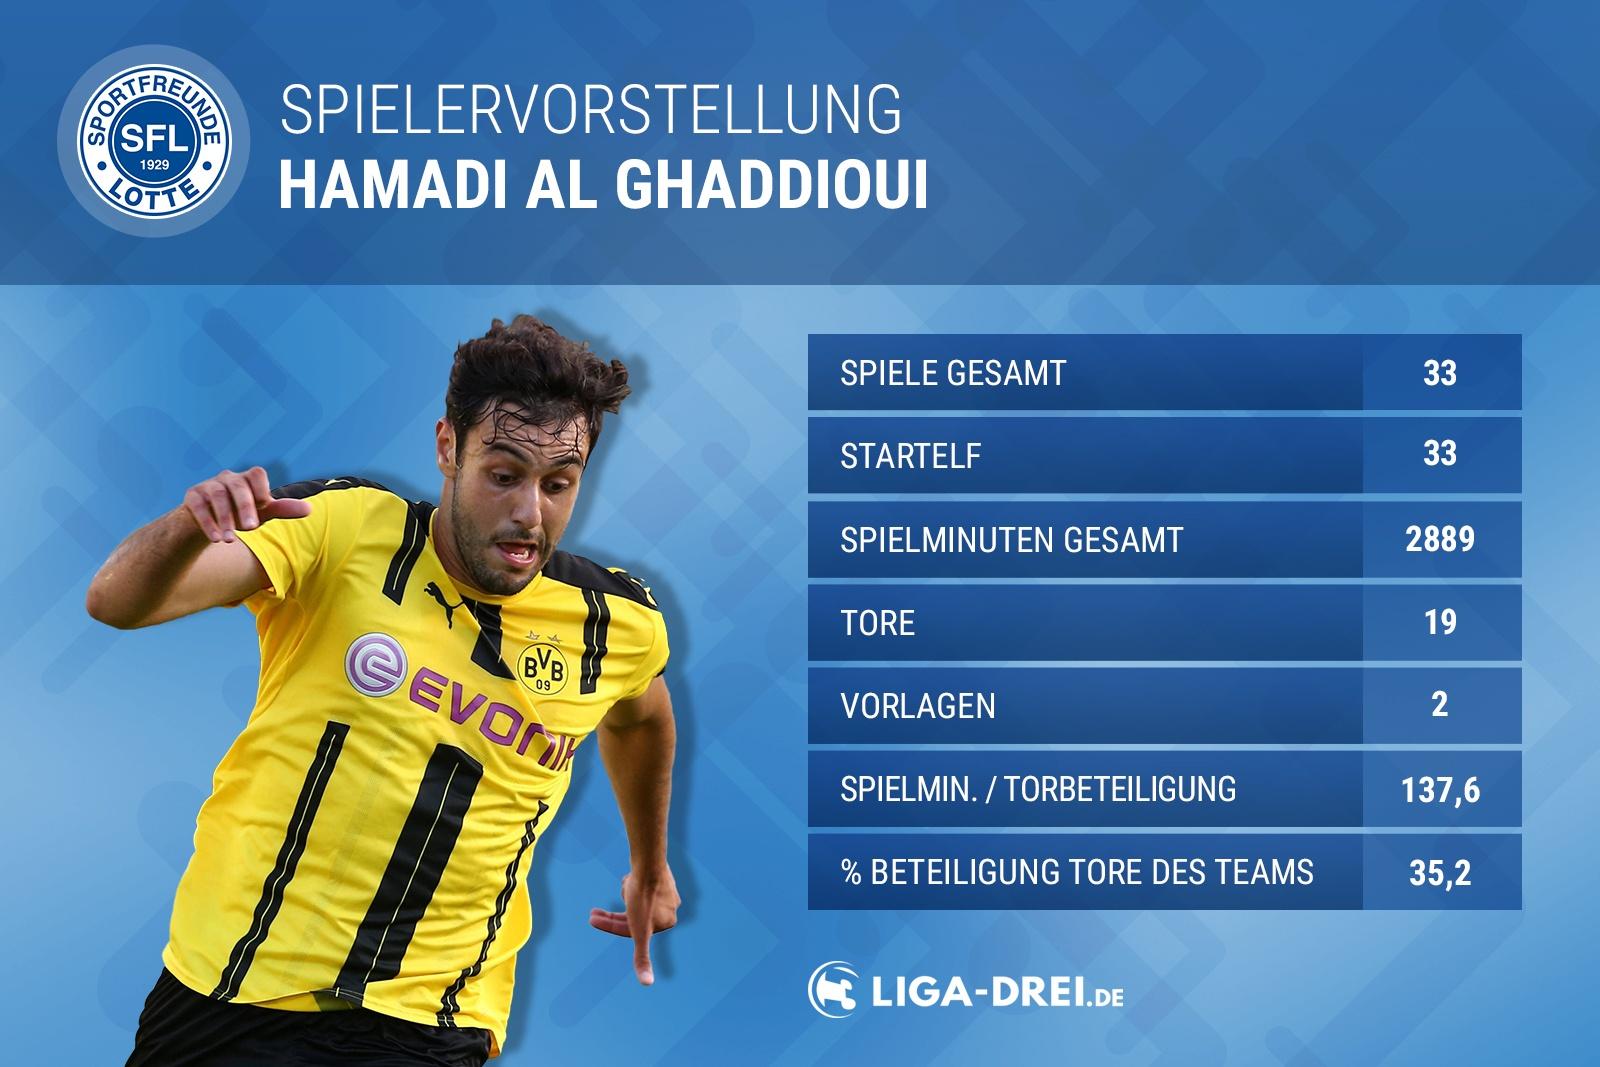 Spielervorstellung Hamadi Al Ghaddioui